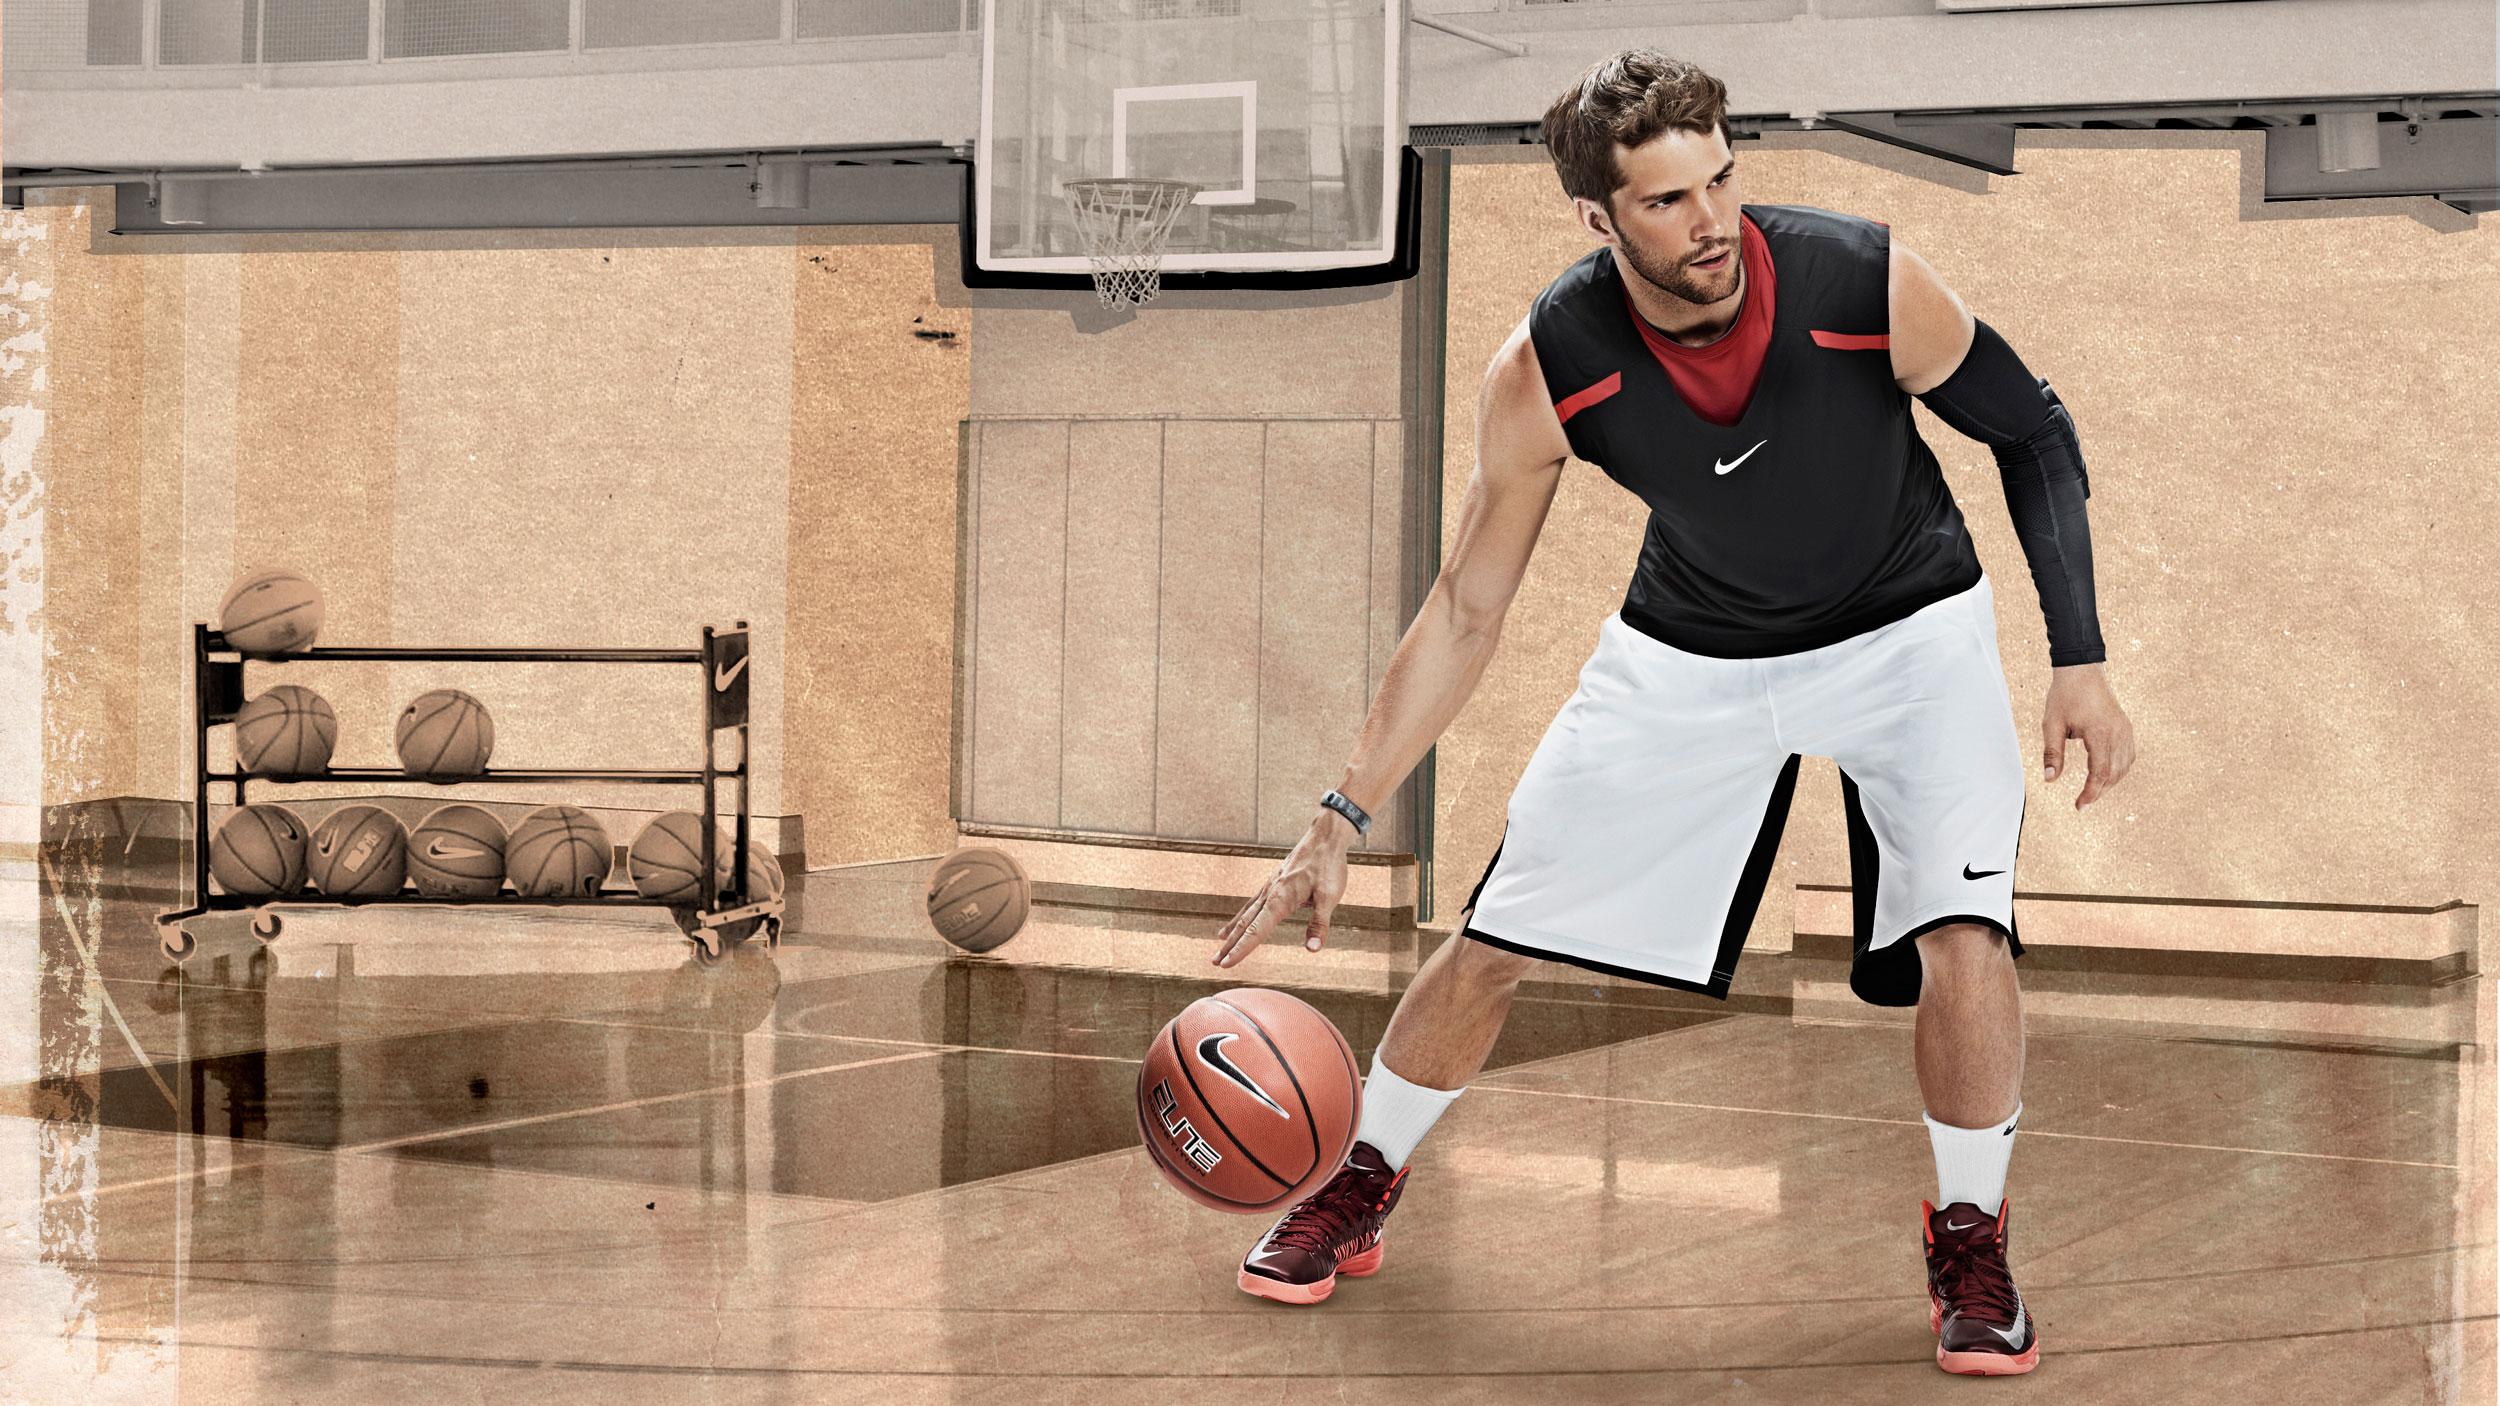 Nike <i>Defy the Elements</i>